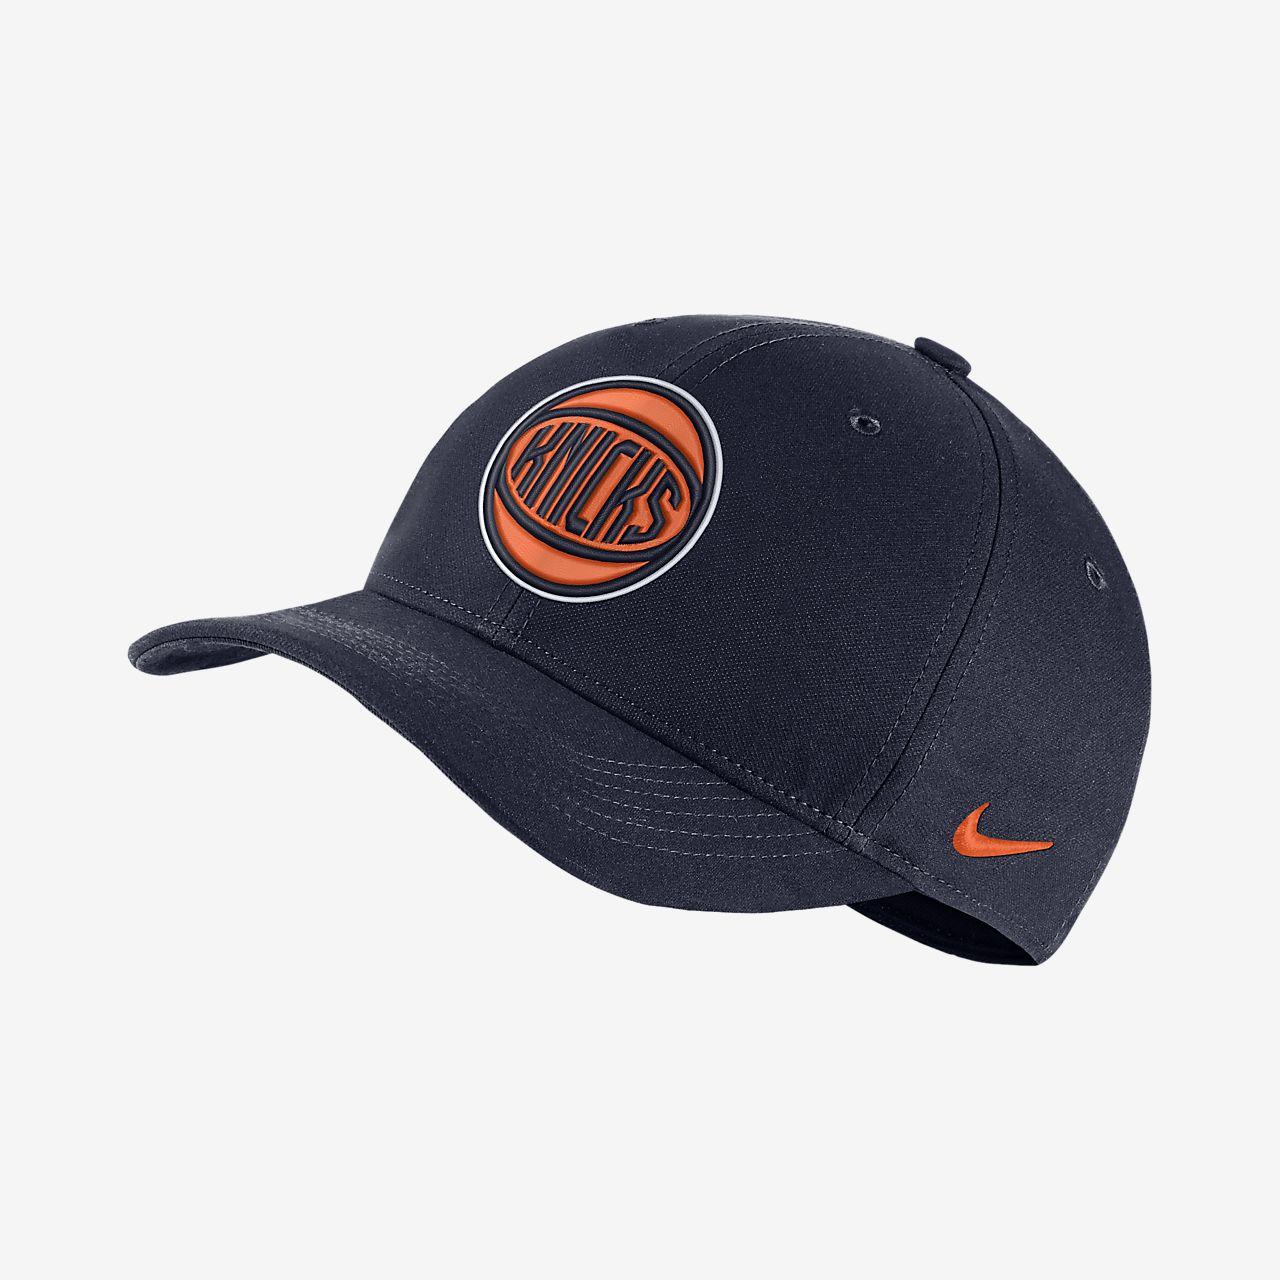 New York Knicks City Edition Nike AeroBill Classic99 NBA-Cap